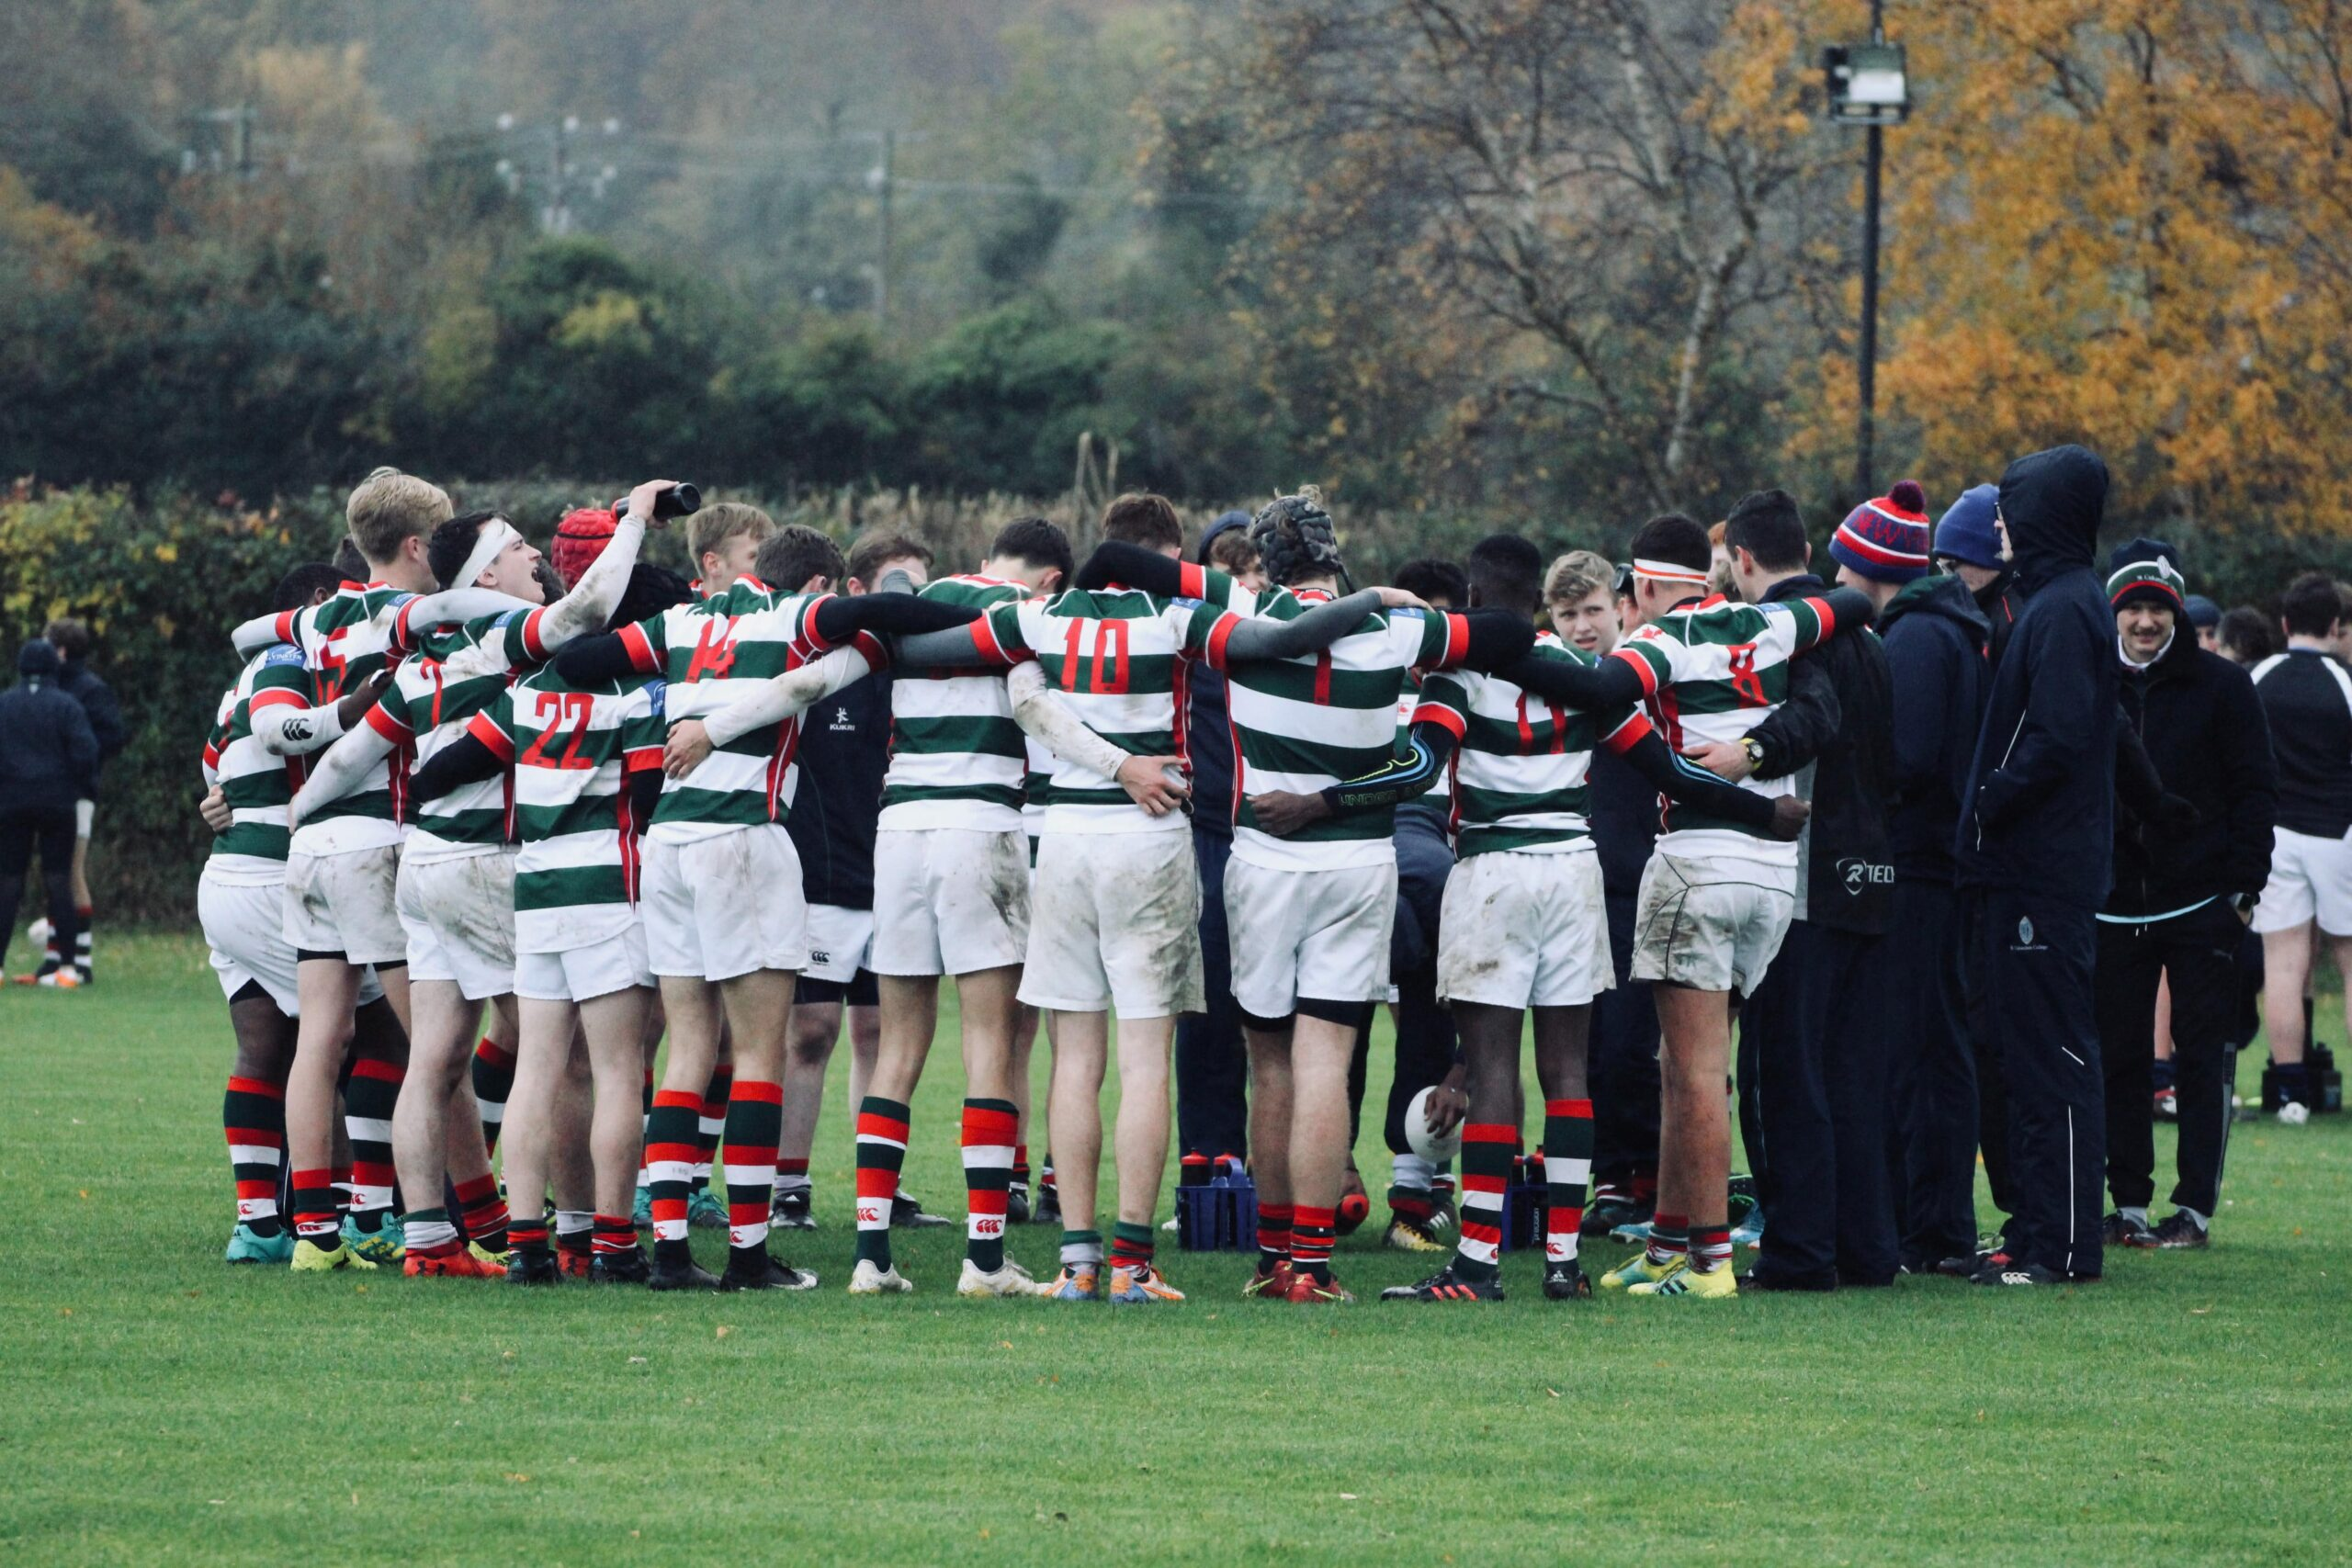 Area Anagrafica - gestione società rugby - GeSoSport